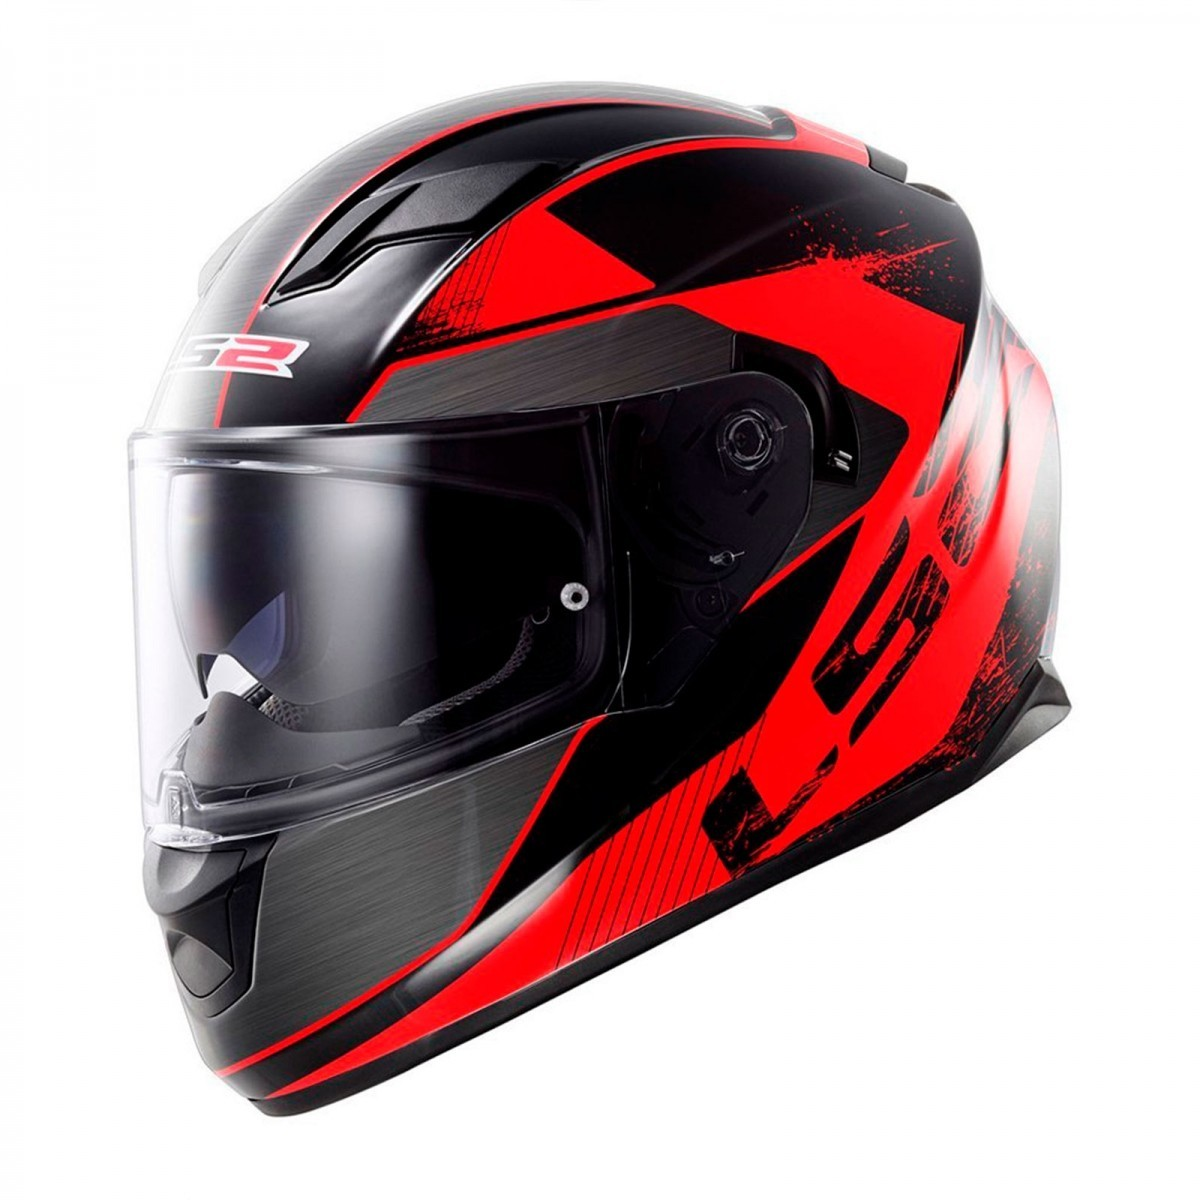 Capacete LS2  FF320 Stinger Black and Red  - Nova Centro Boutique Roupas para Motociclistas